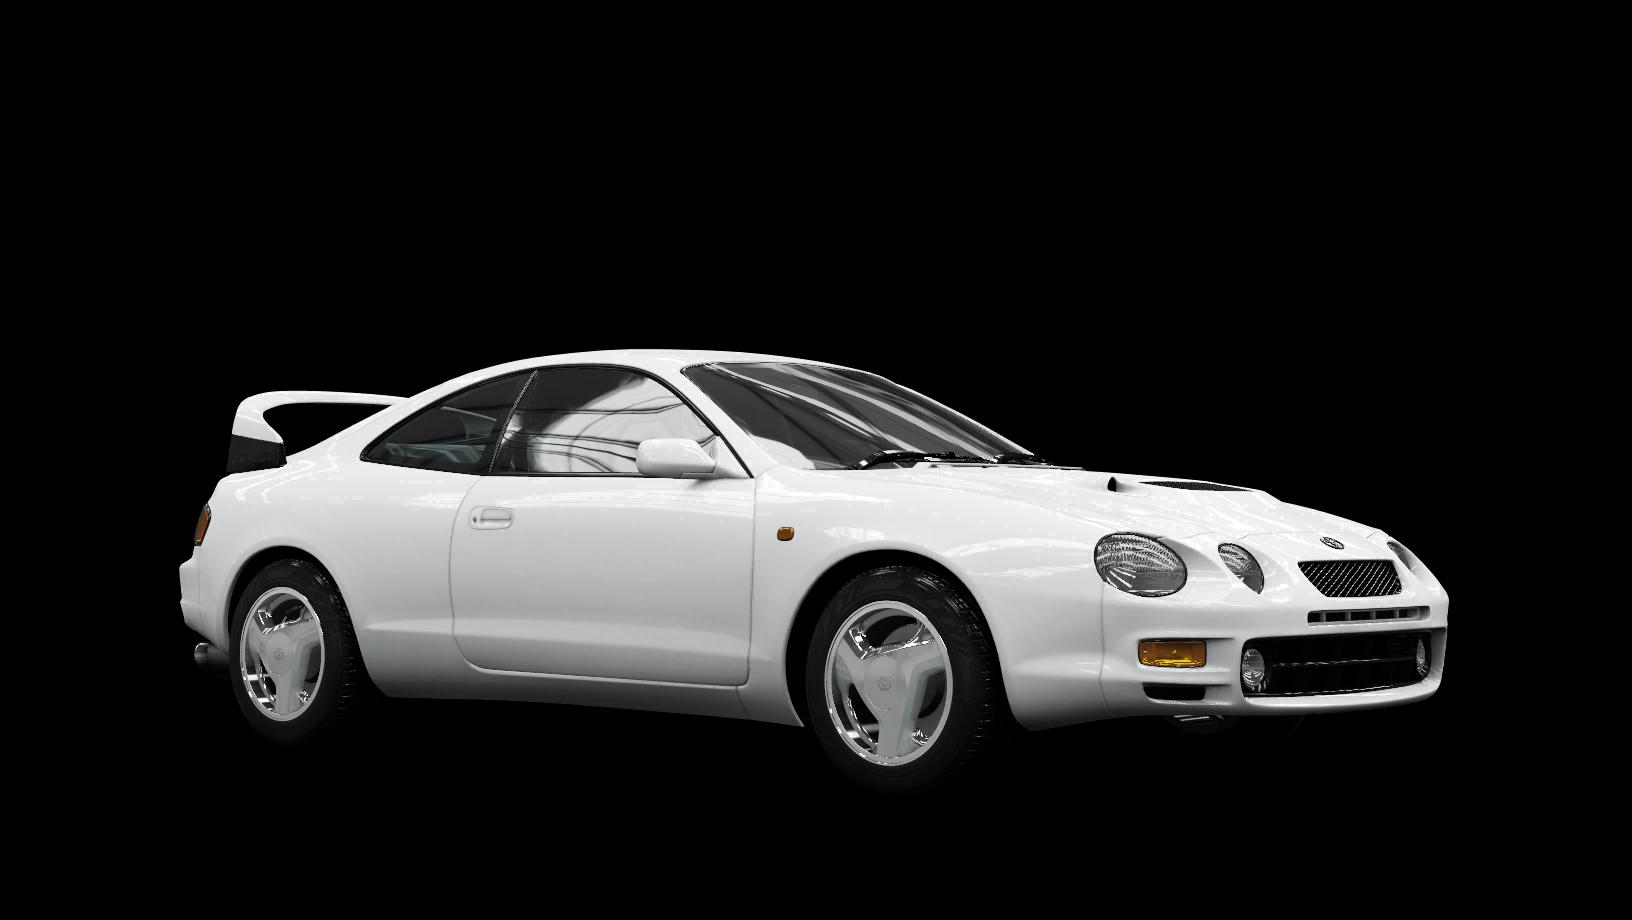 Kelebihan Toyota Celica Harga